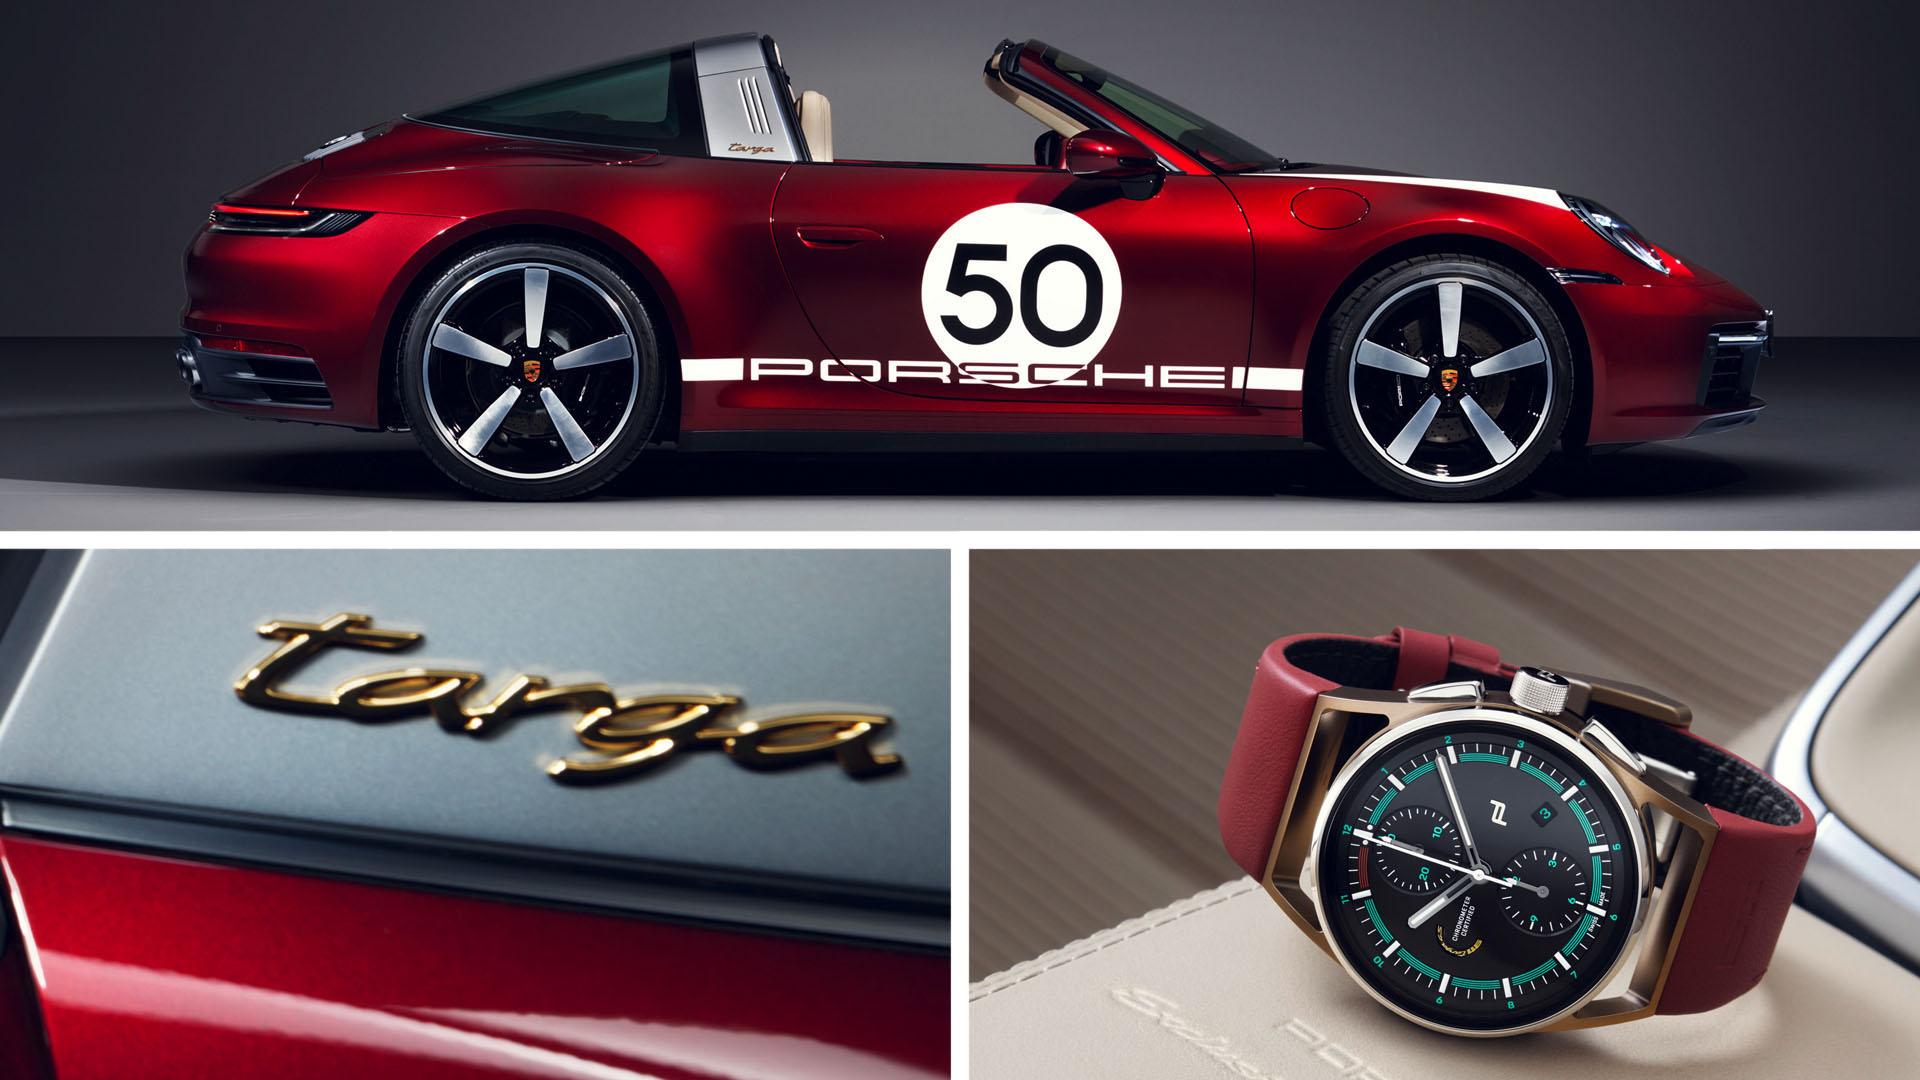 POrsche 911 targa 4 s Heritage Design Edition 2021